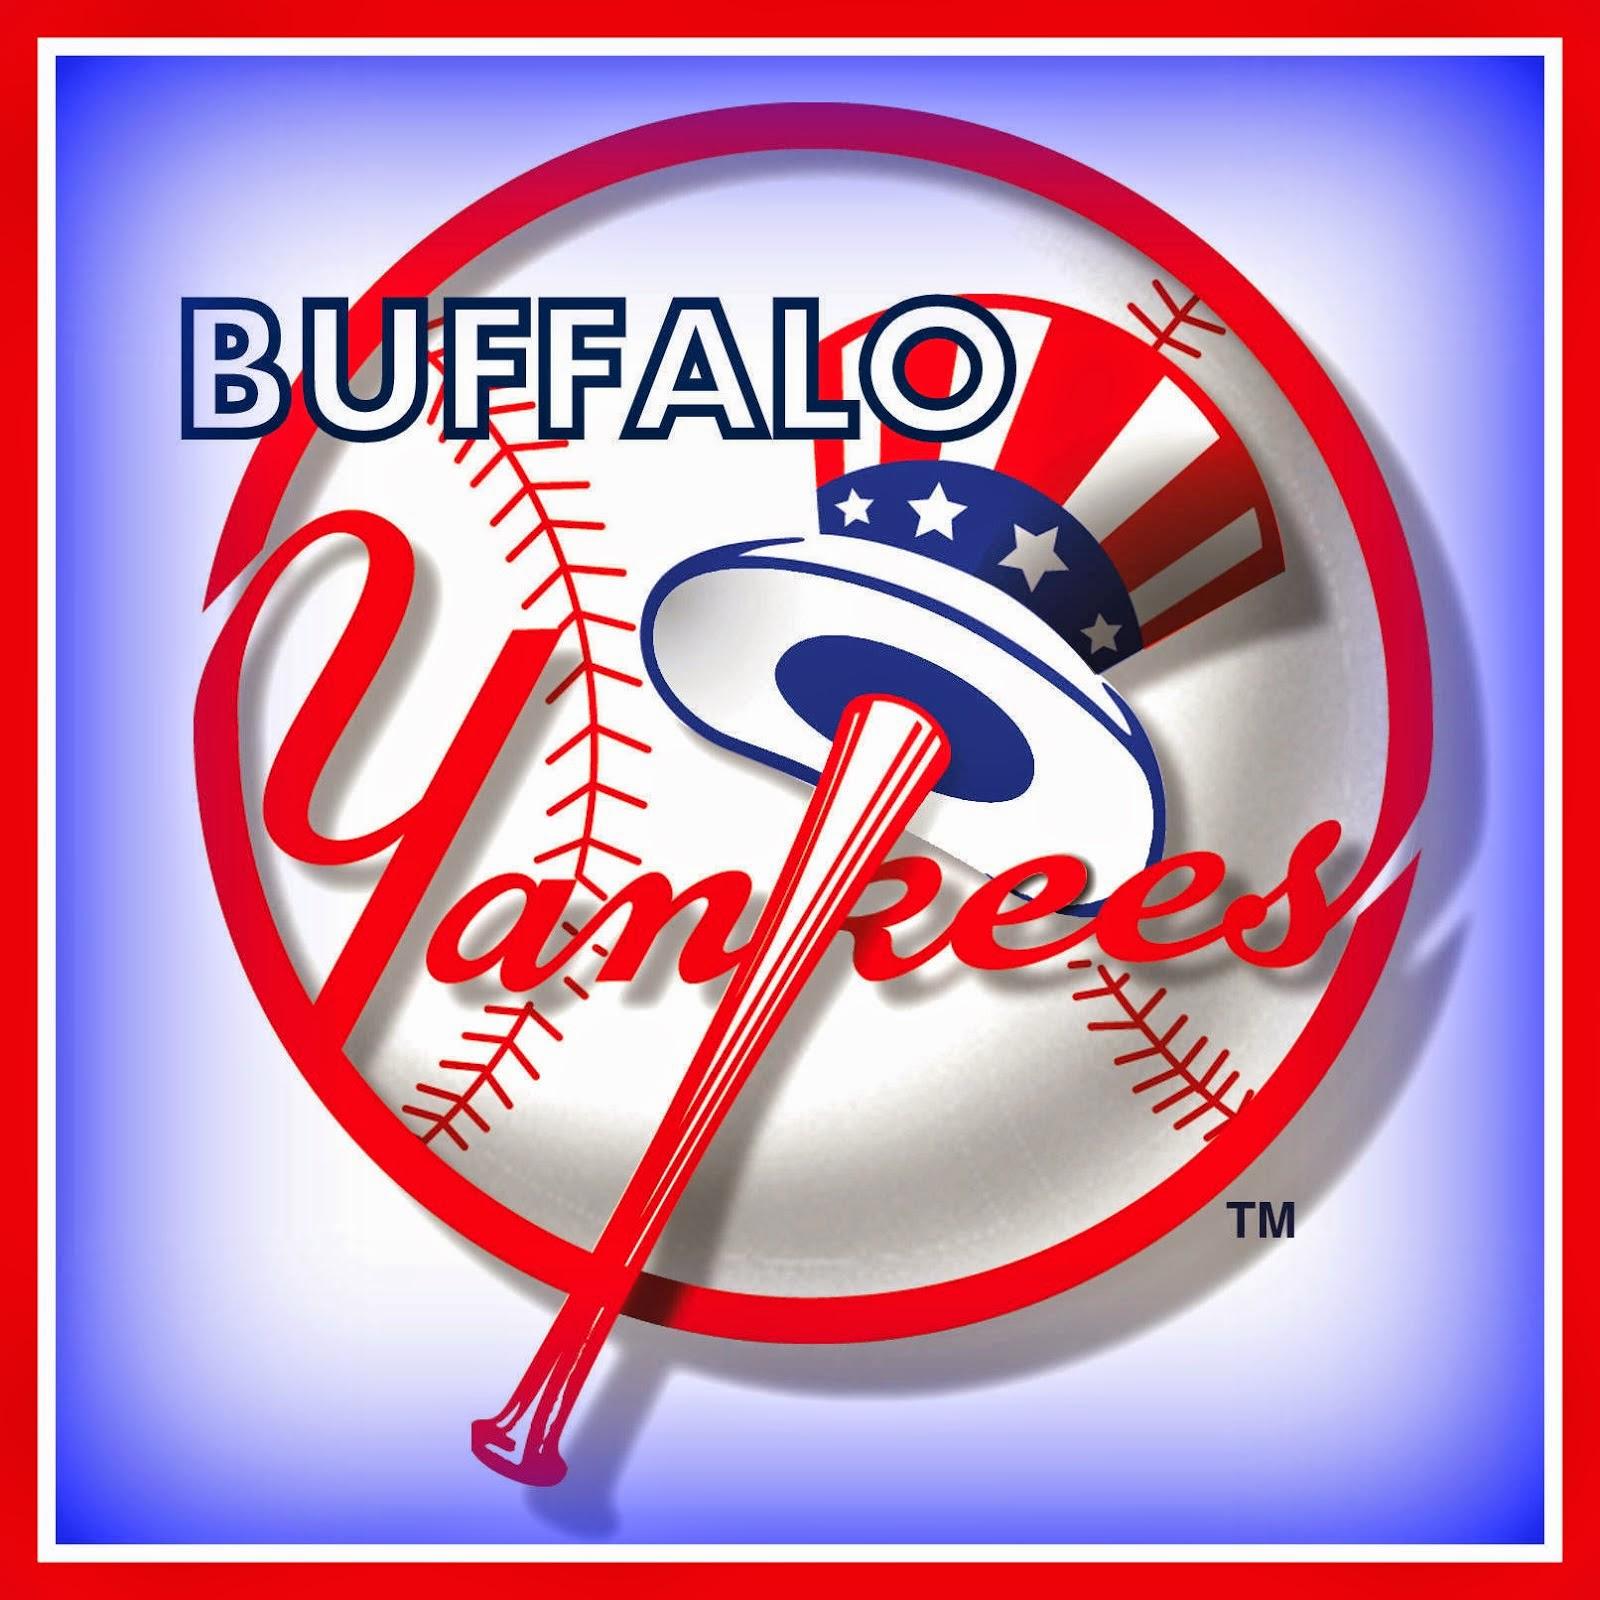 Buffalo Yankees